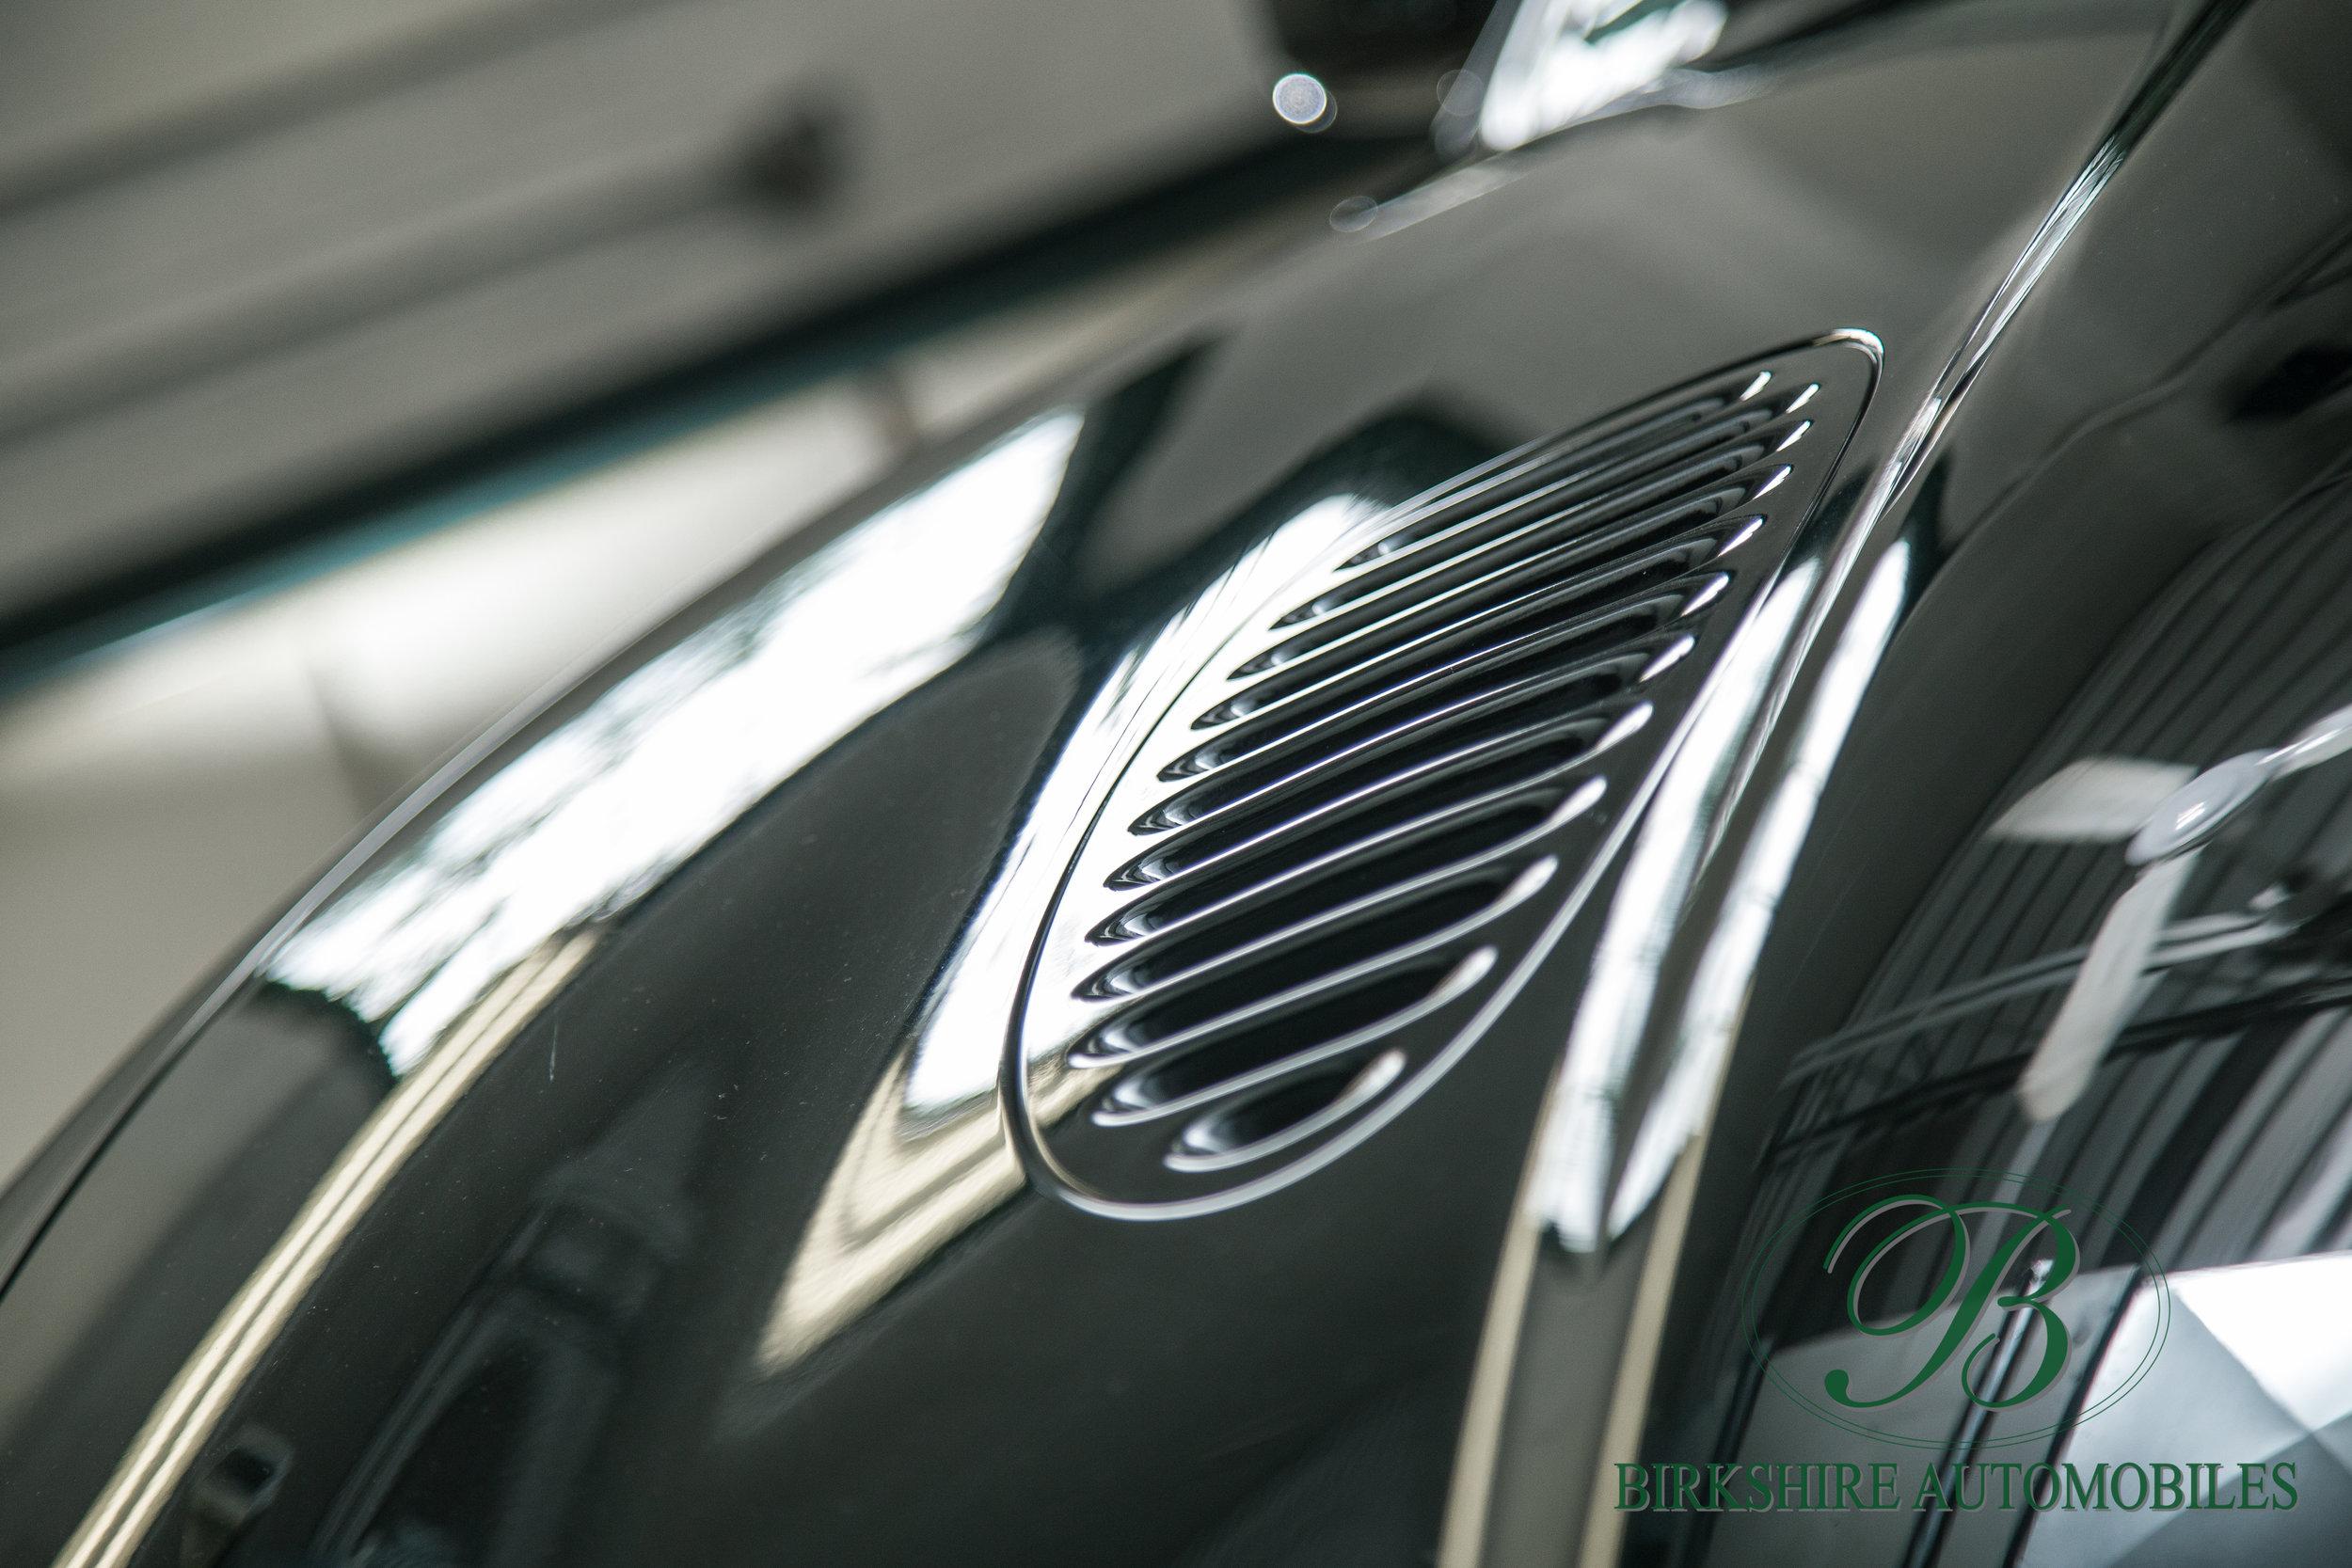 Birkshire Automobiles-2001 Jaguar XKR Convertible (13).jpg